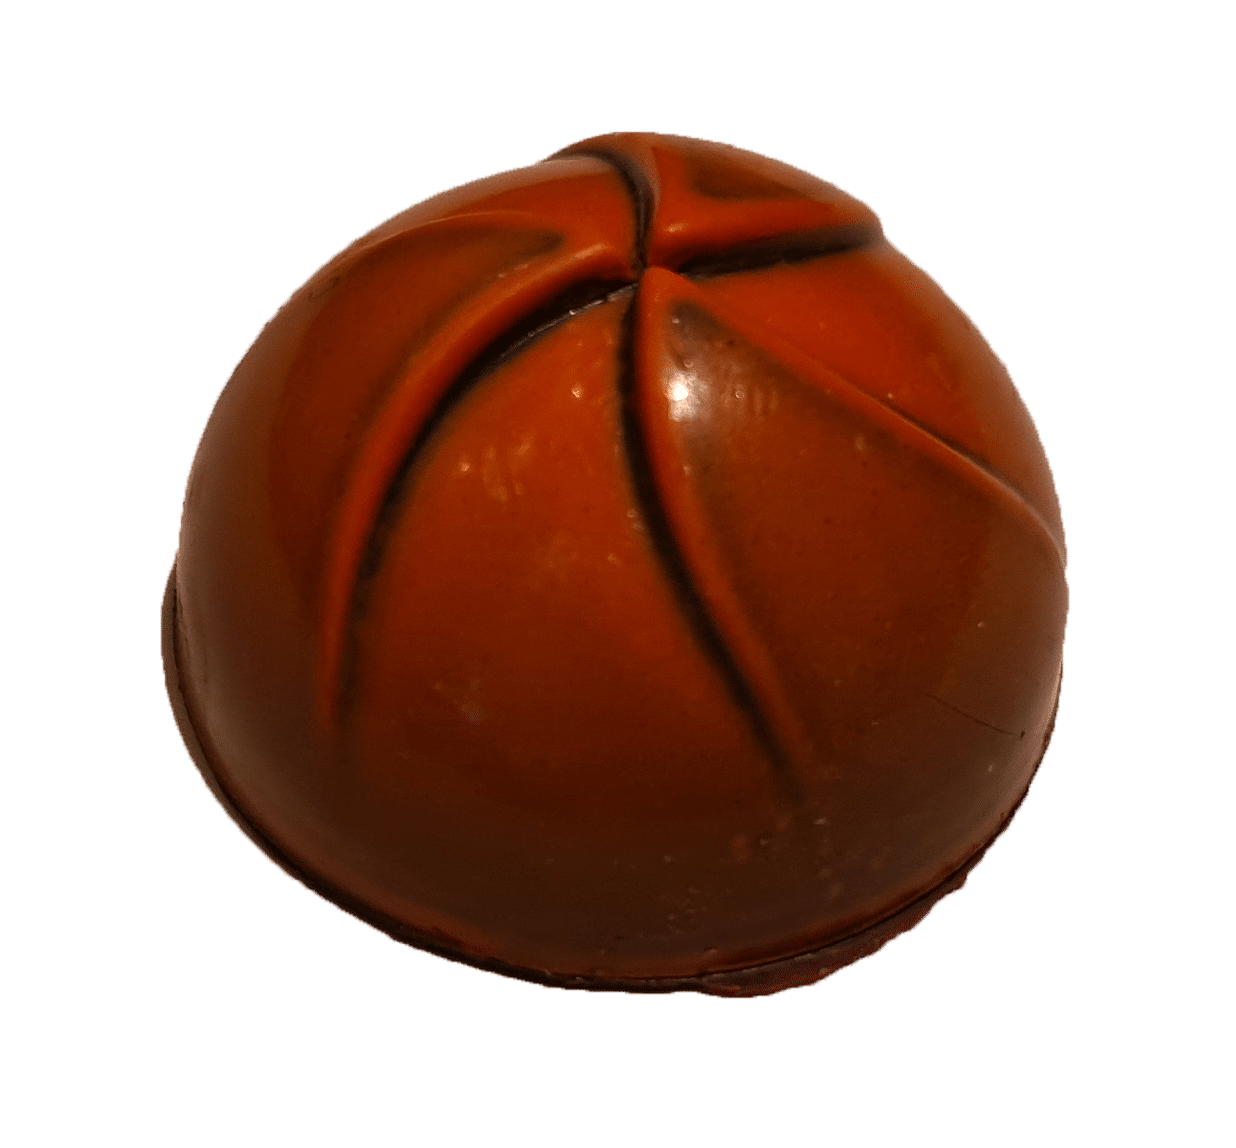 Arhuaco bonbon